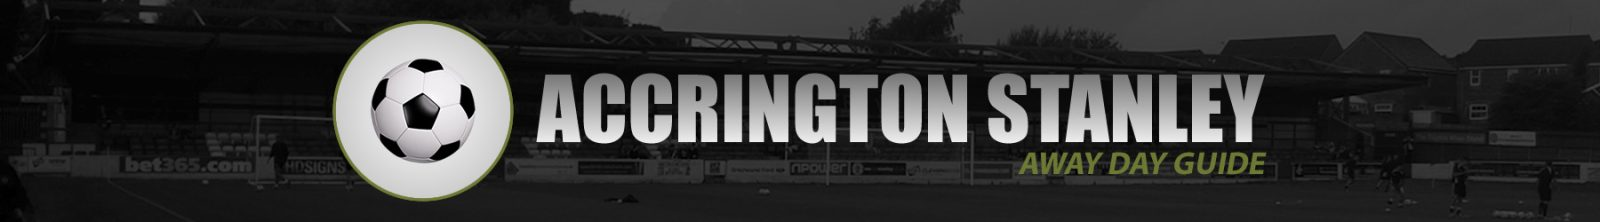 Accrington Stanley Away